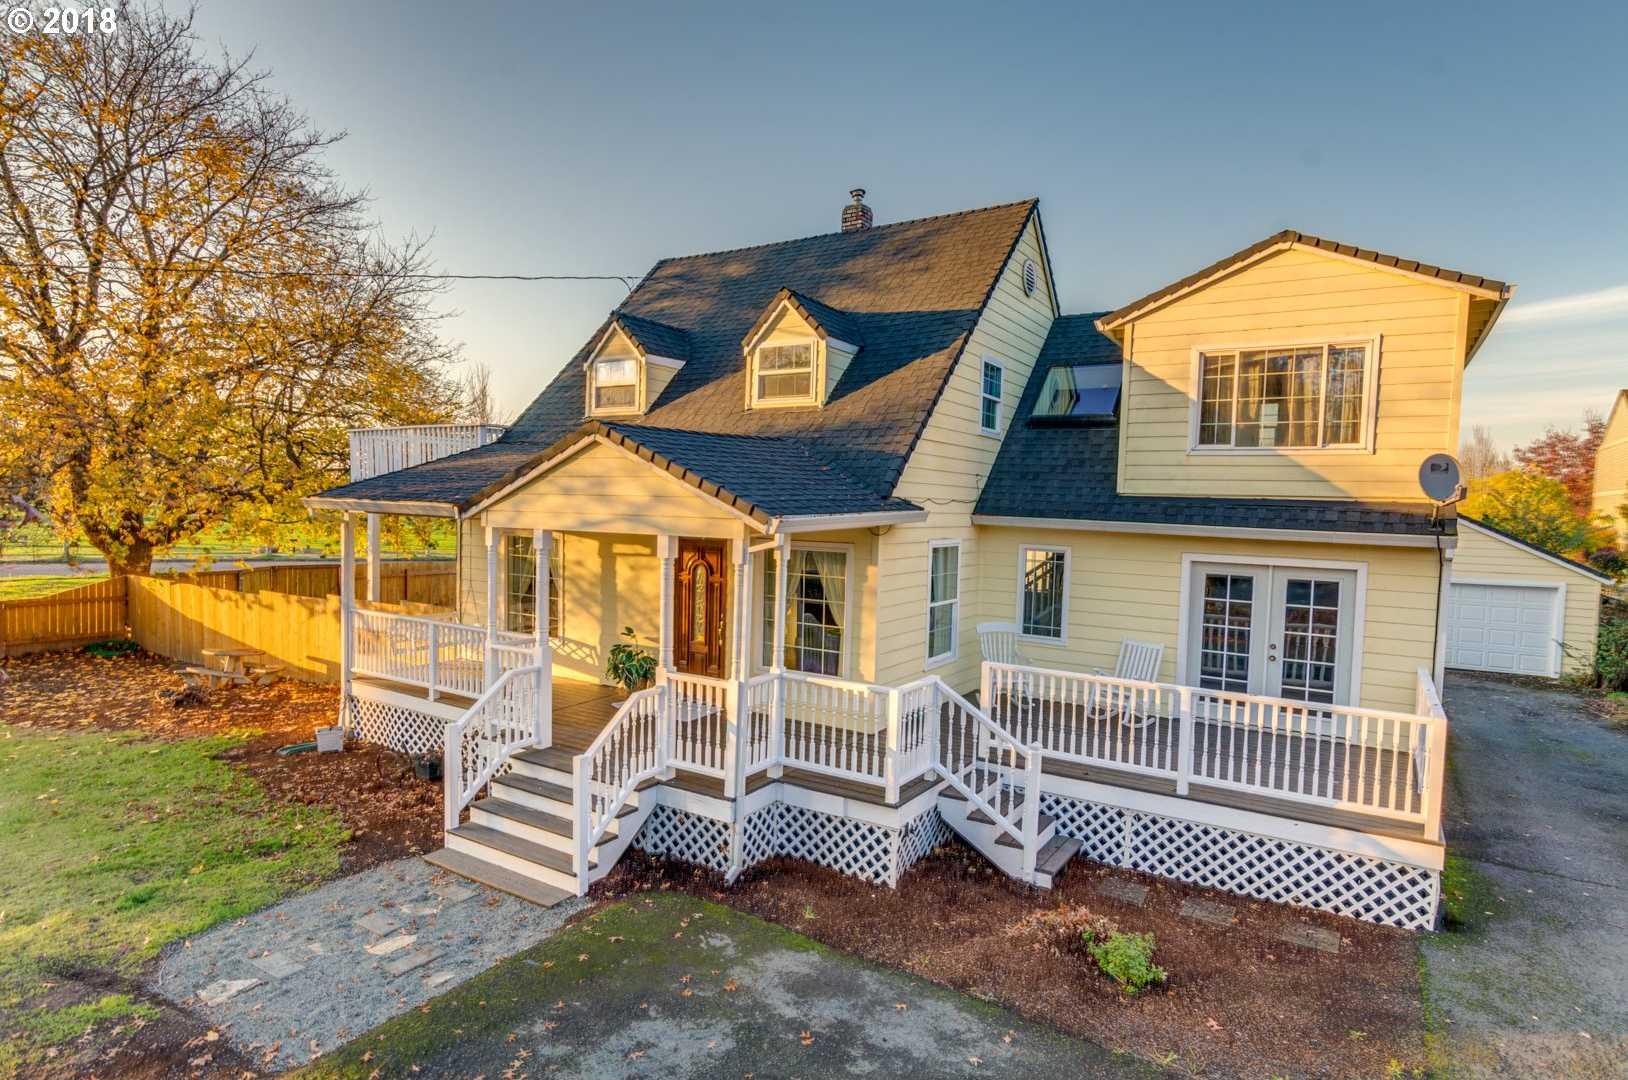 $449,000 - 4Br/2Ba -  for Sale in Mt. Hood, Gresham